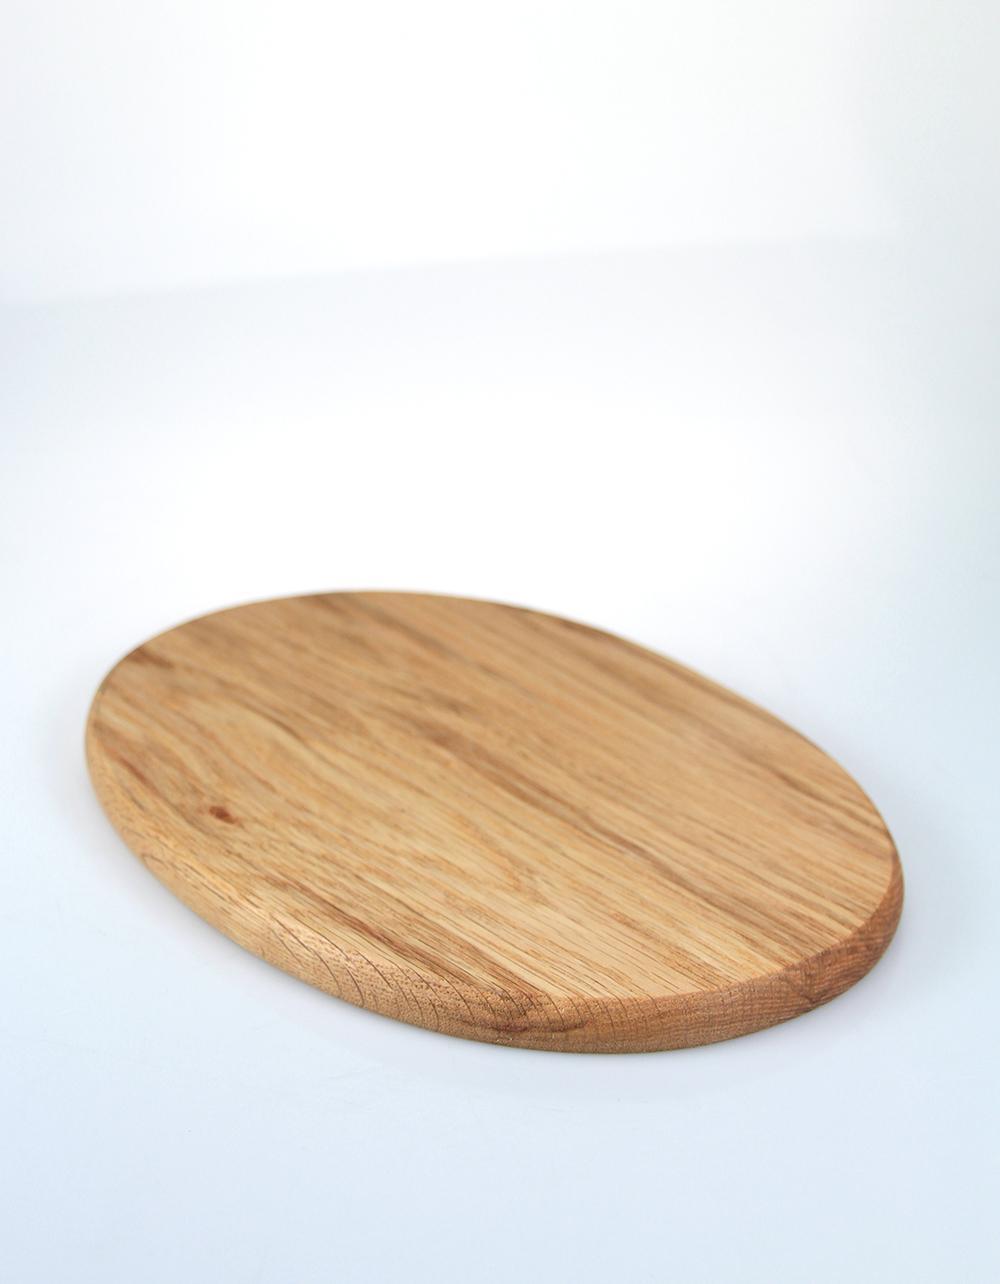 The Essential Ingredient German Oak Oval Chopping Board 25.5cm x 17cm